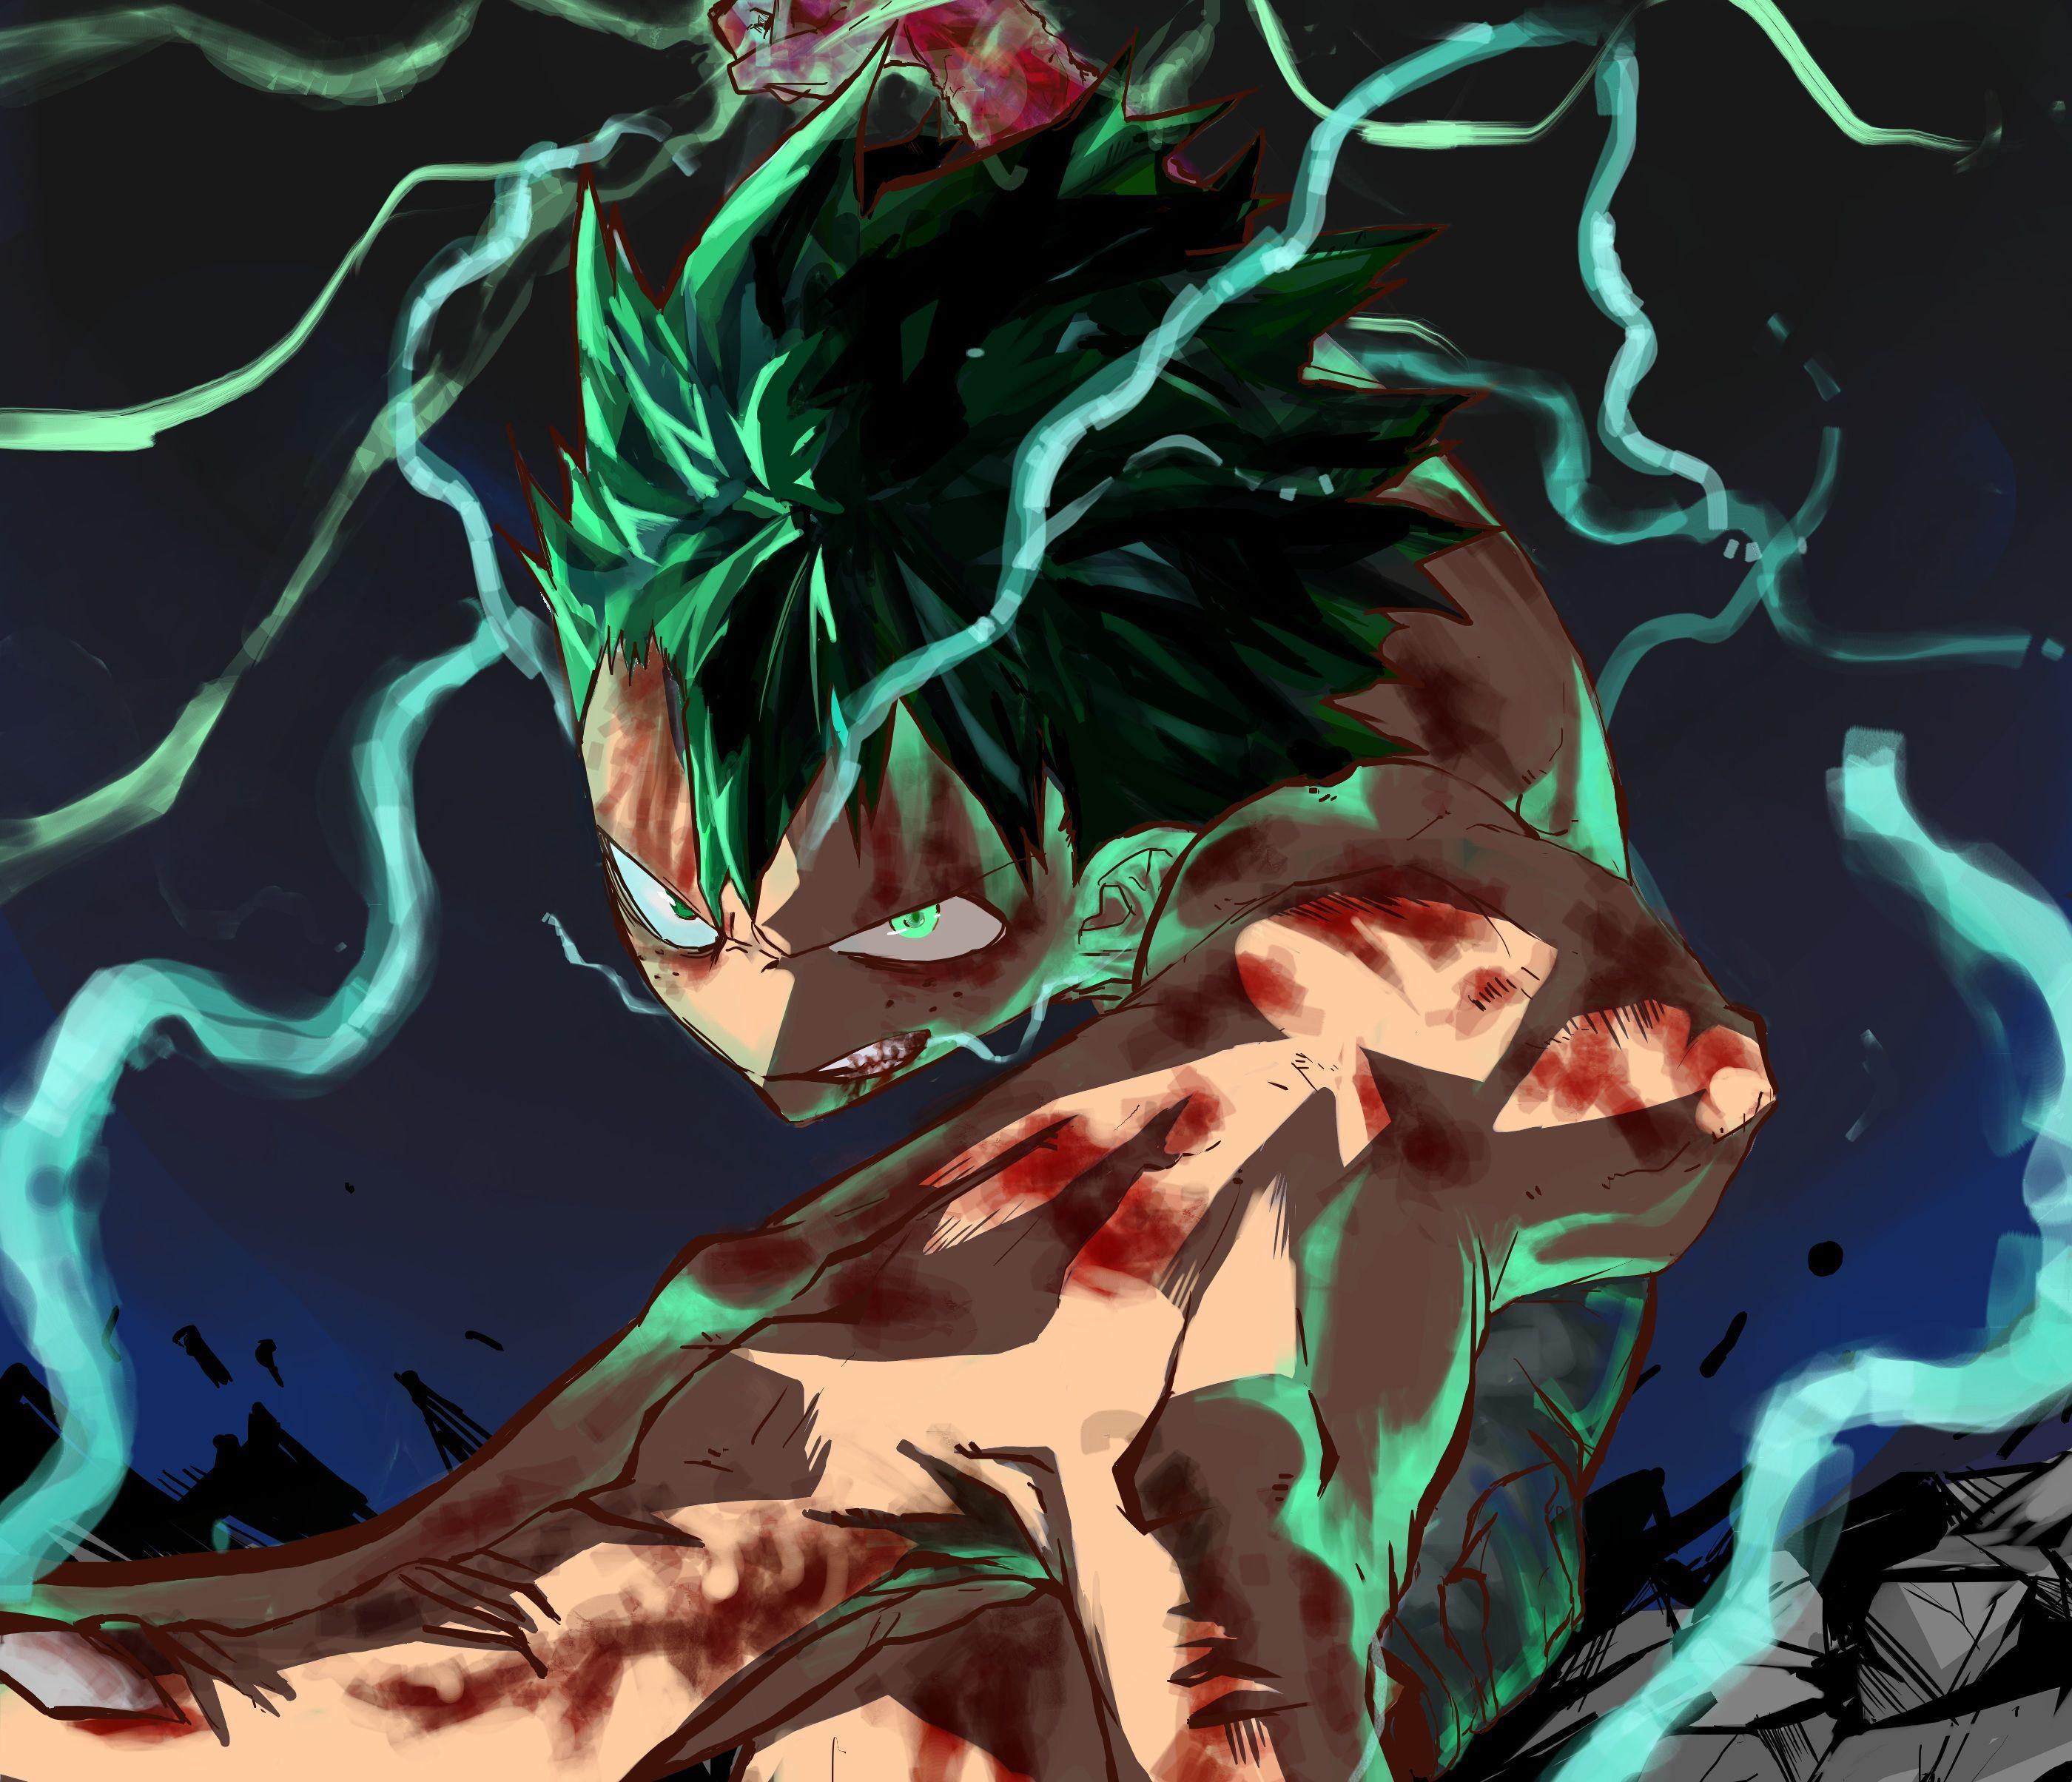 2800x2408 Hình nền của Anime, My Hero Academia, Izuku Midoriya - Midoriya Izuku Hình nền có độ phân giải cao - Hình nền 2800x2408 - teahub.io